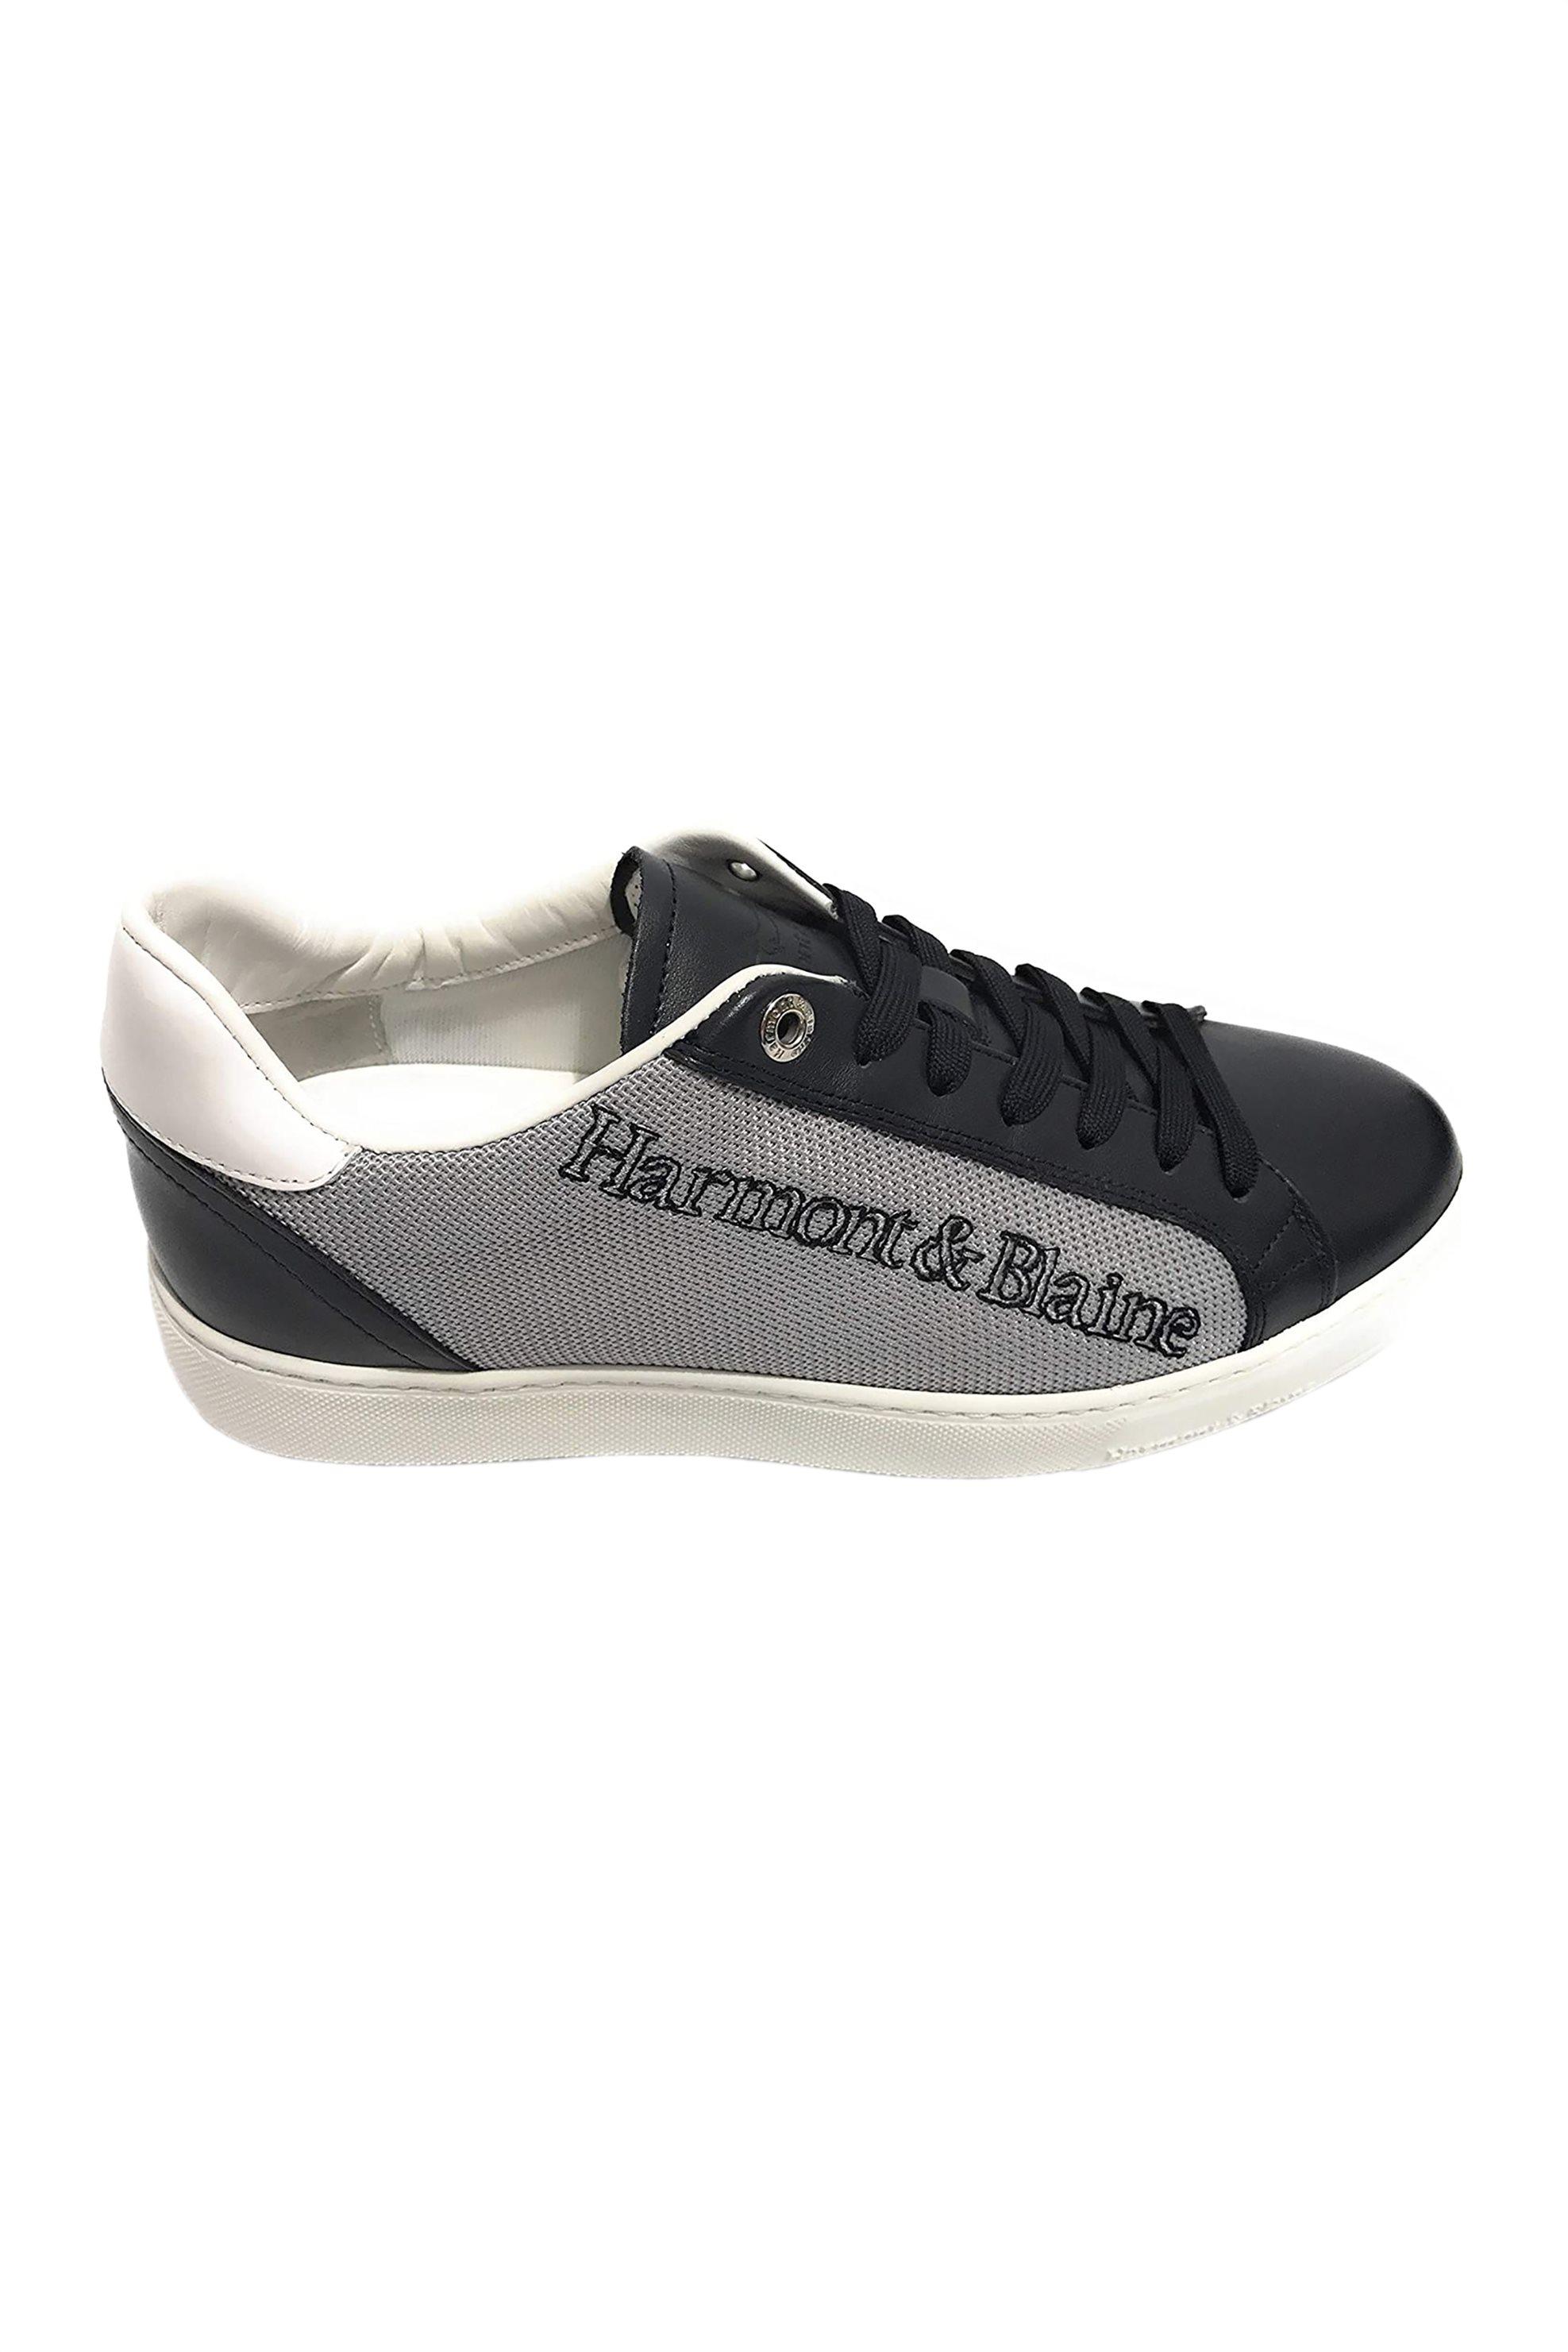 Harmont & Blaine ανδρικά sneakers με lettering κέντημα – EFM201034-6220 – Μπλε Σκούρο